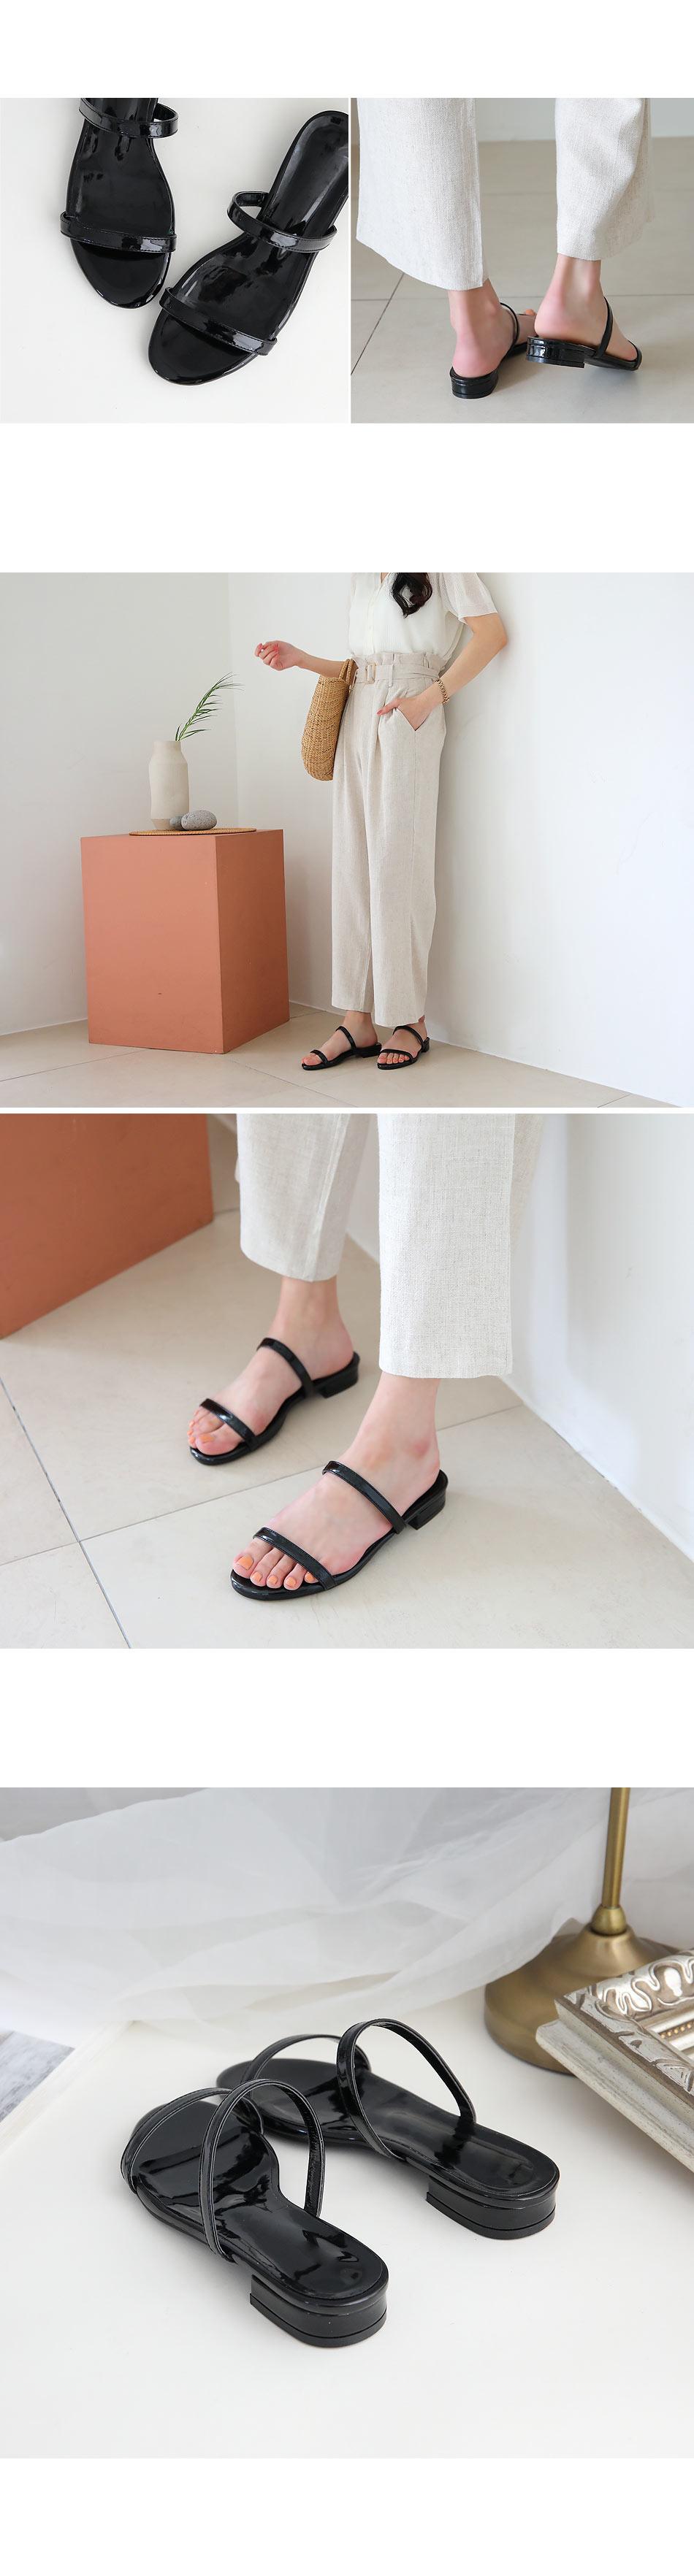 Xenon slippers 2cm